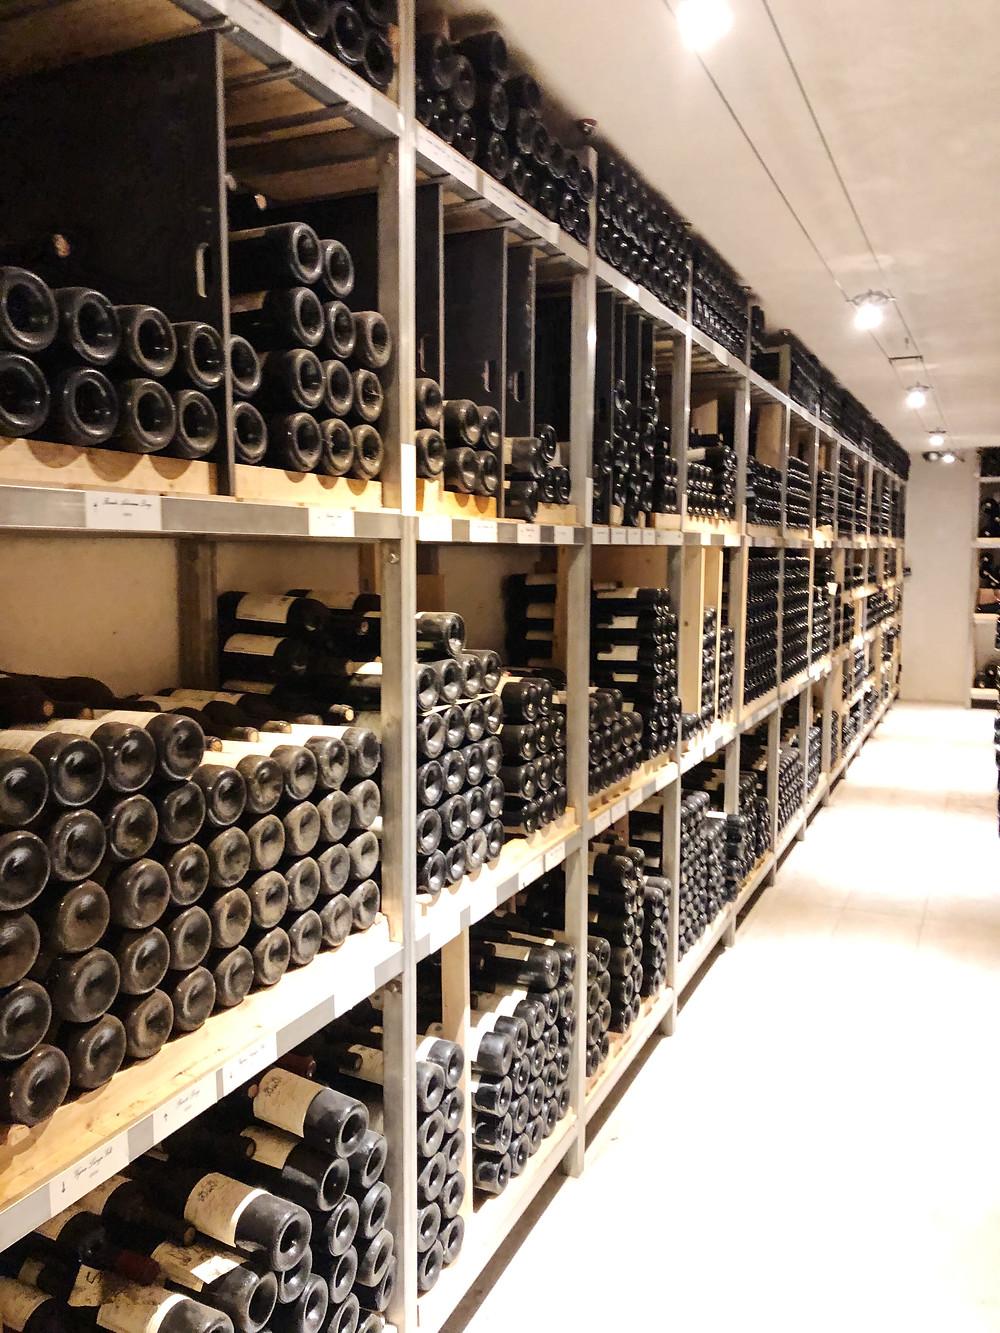 wine cellar full of Barolo bottles at Elio Altare in La Morra